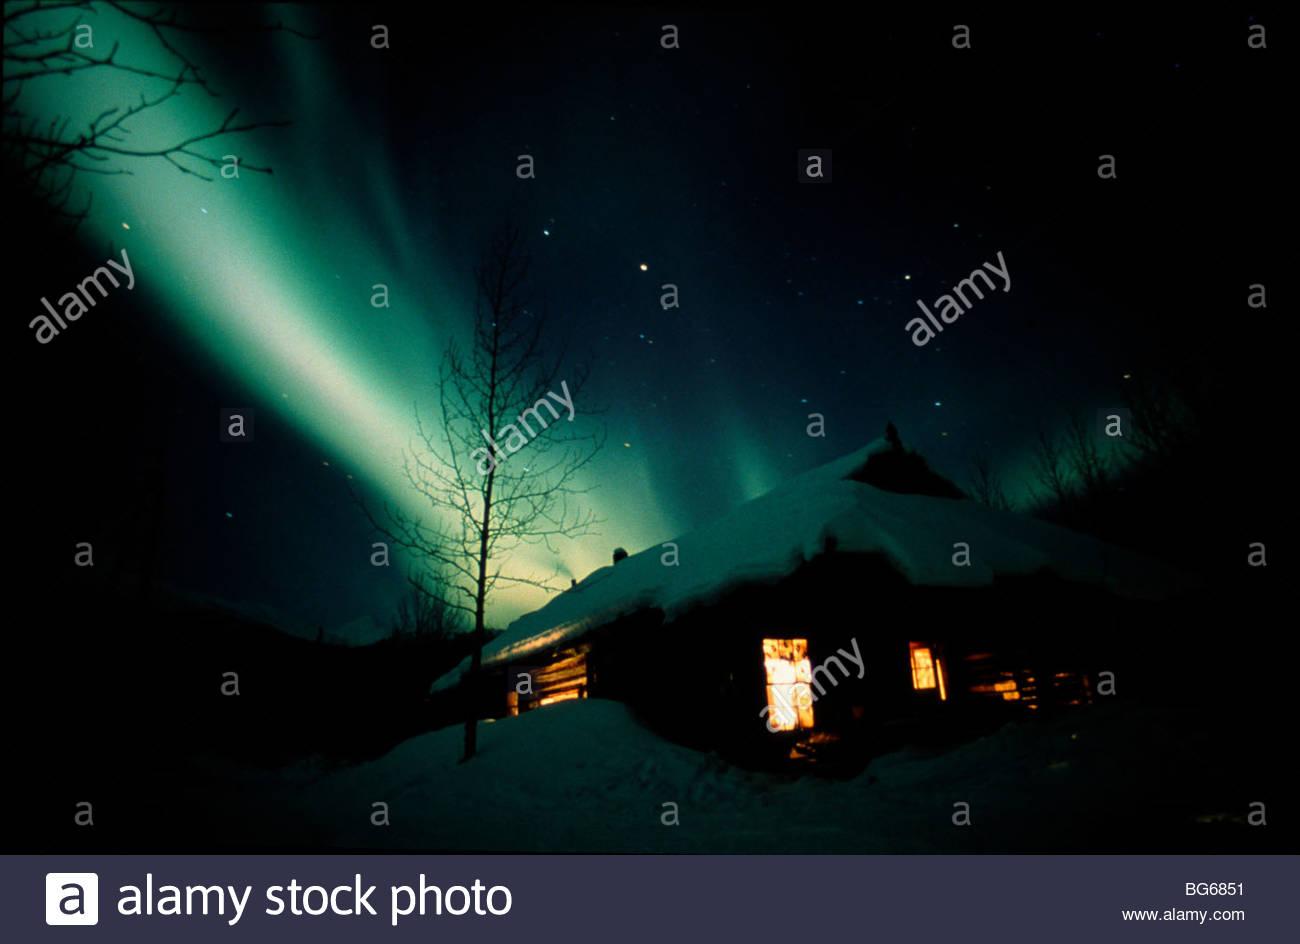 Alaska. Brooks Range. Aurora Borealis. PR - Stock Image